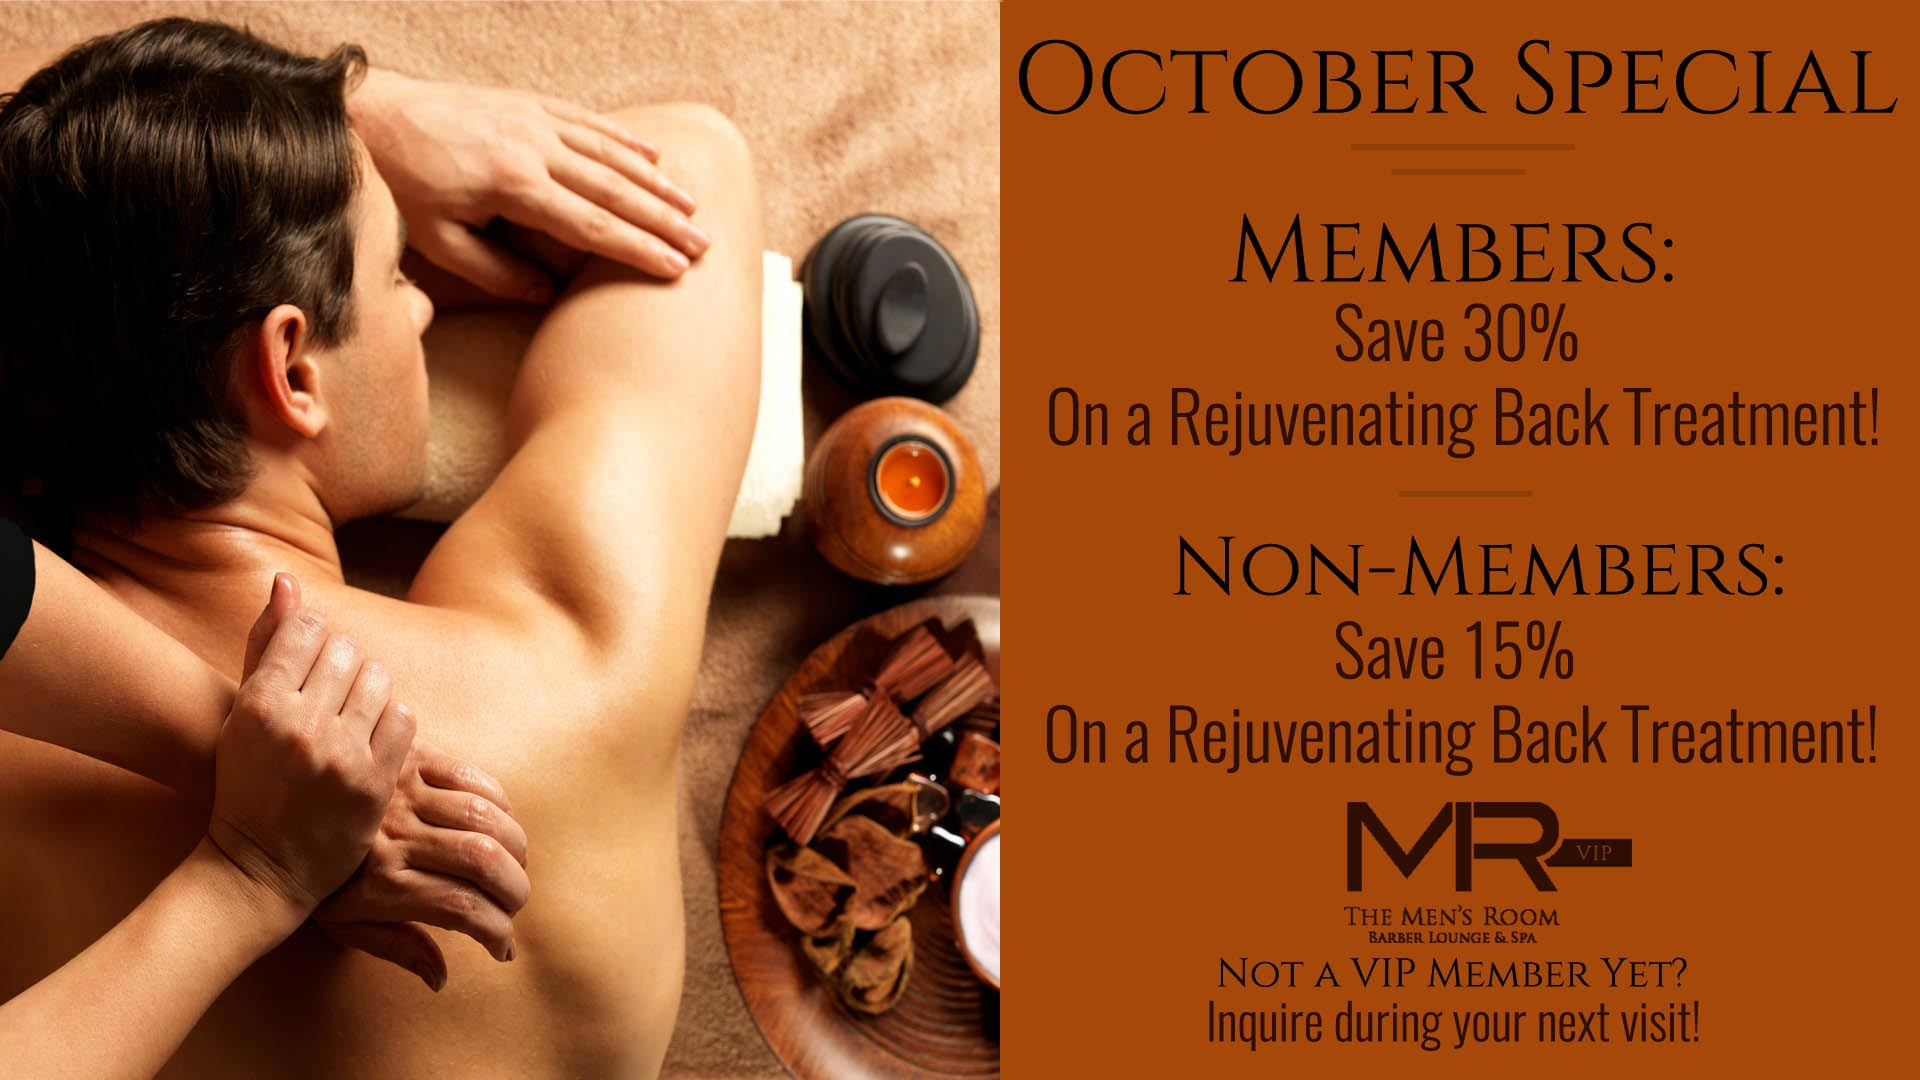 The Men's Room October Special